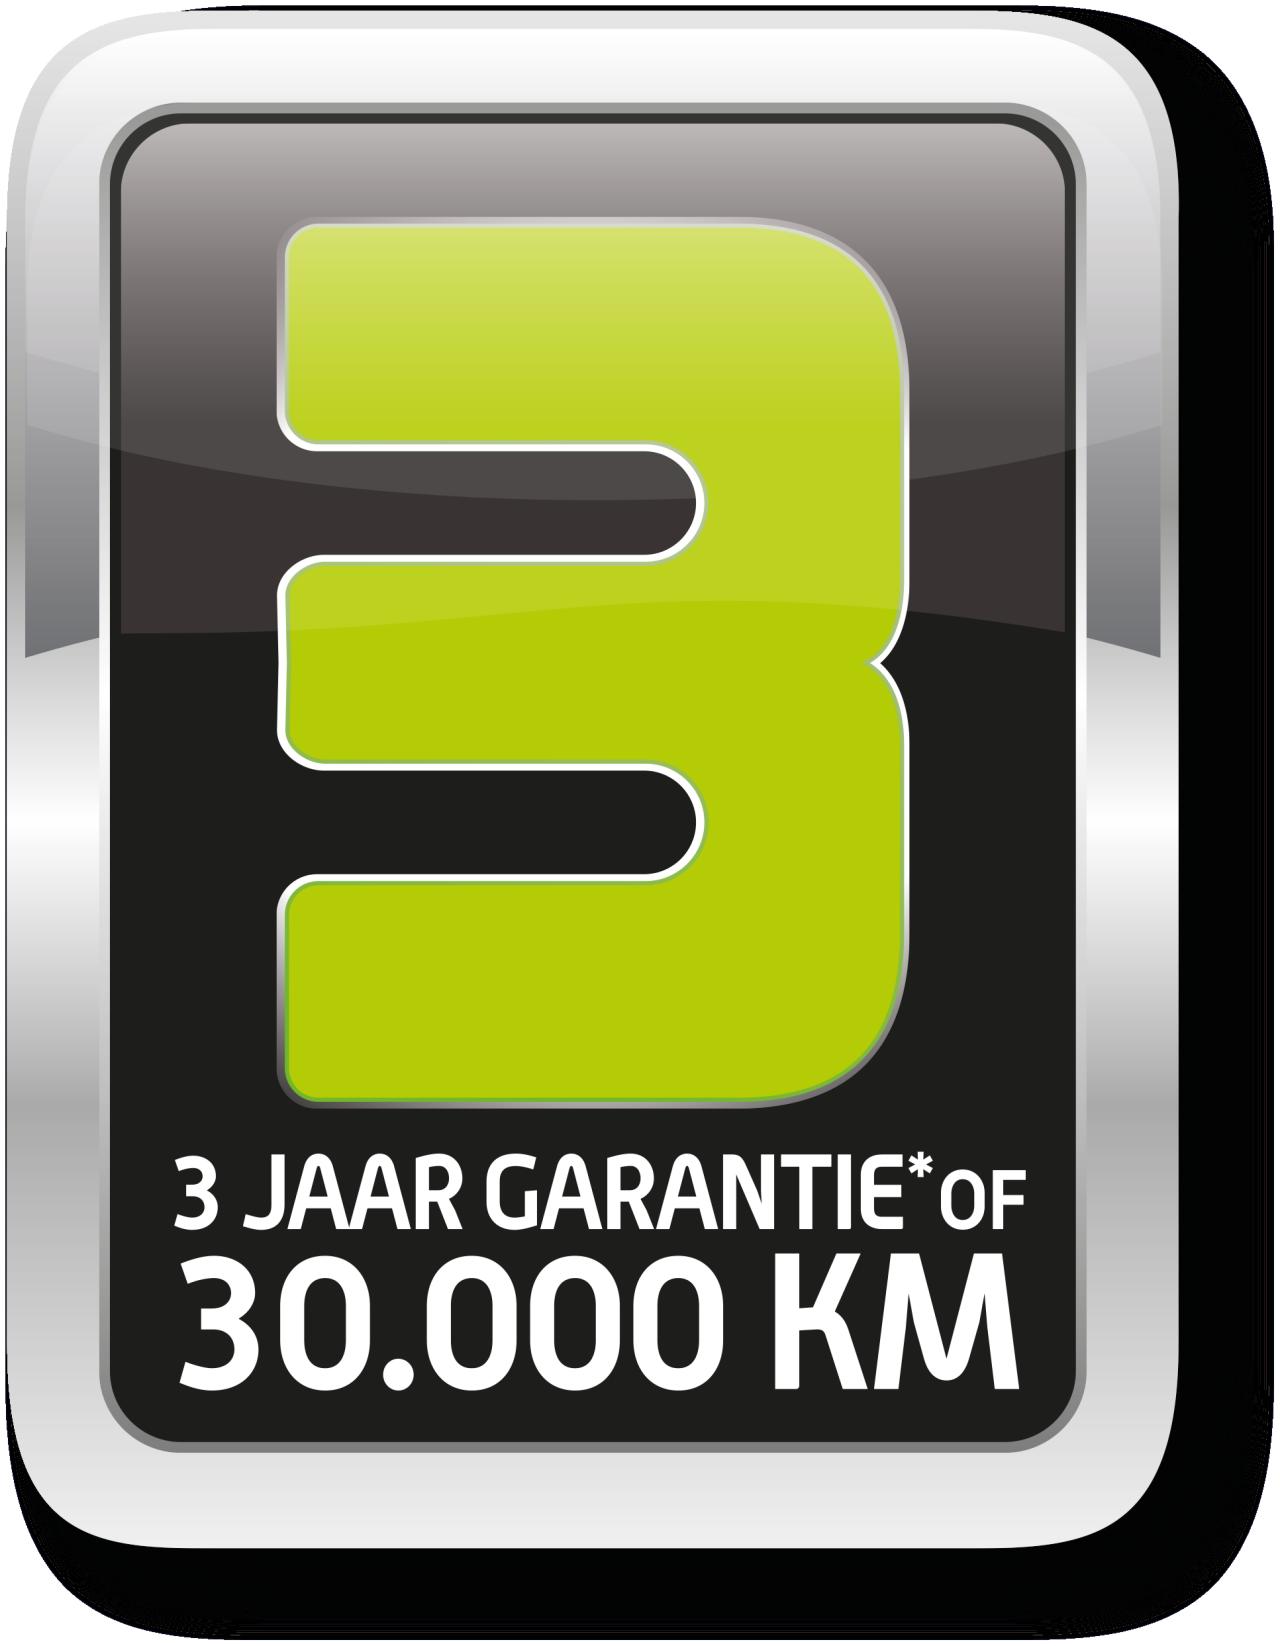 SYM garantie logo